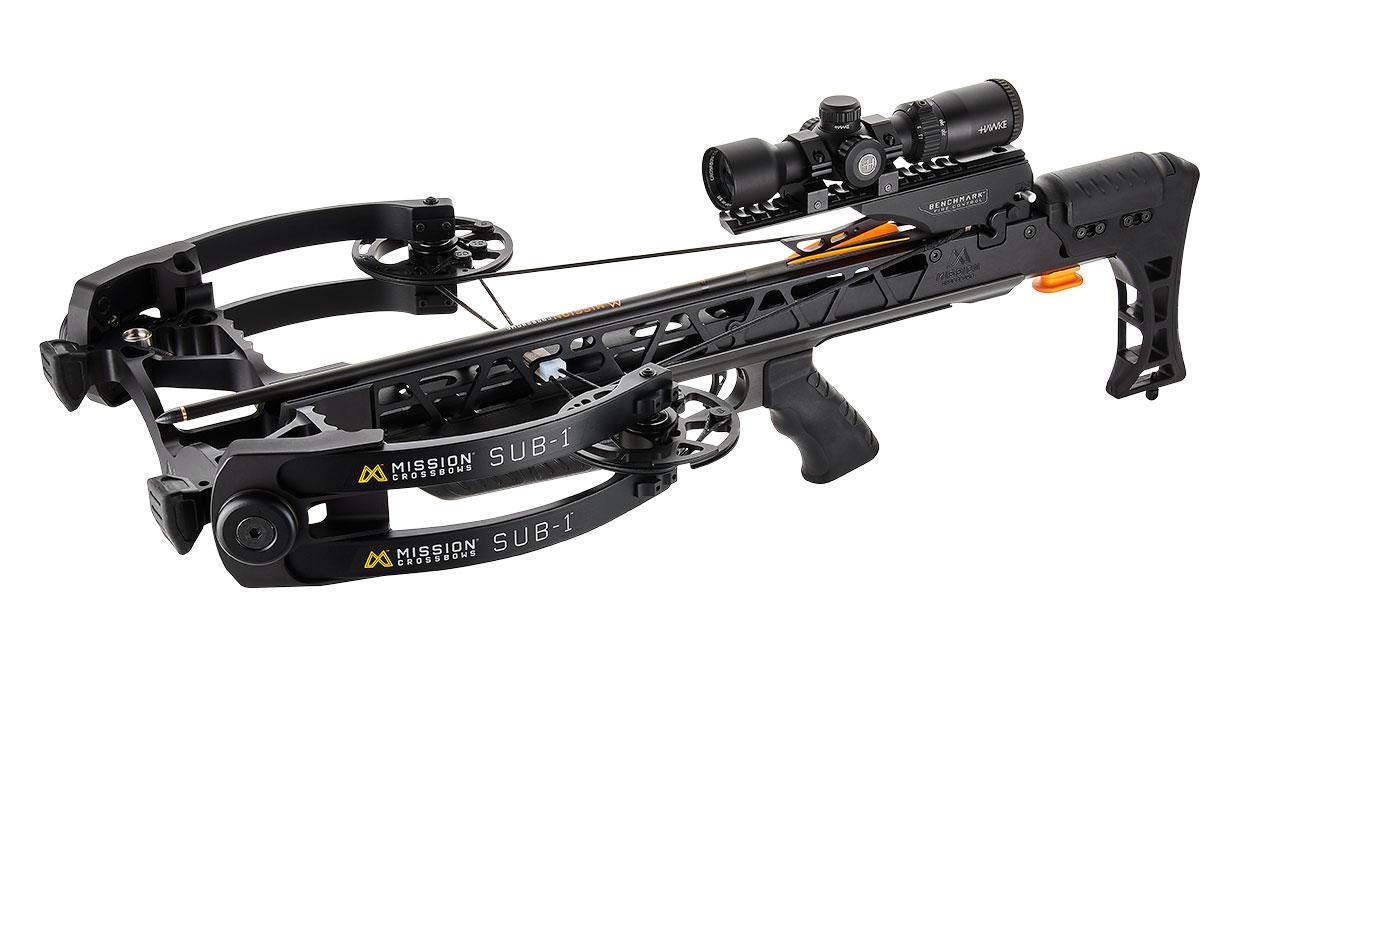 Crossbow pistol: characteristics, description, photo